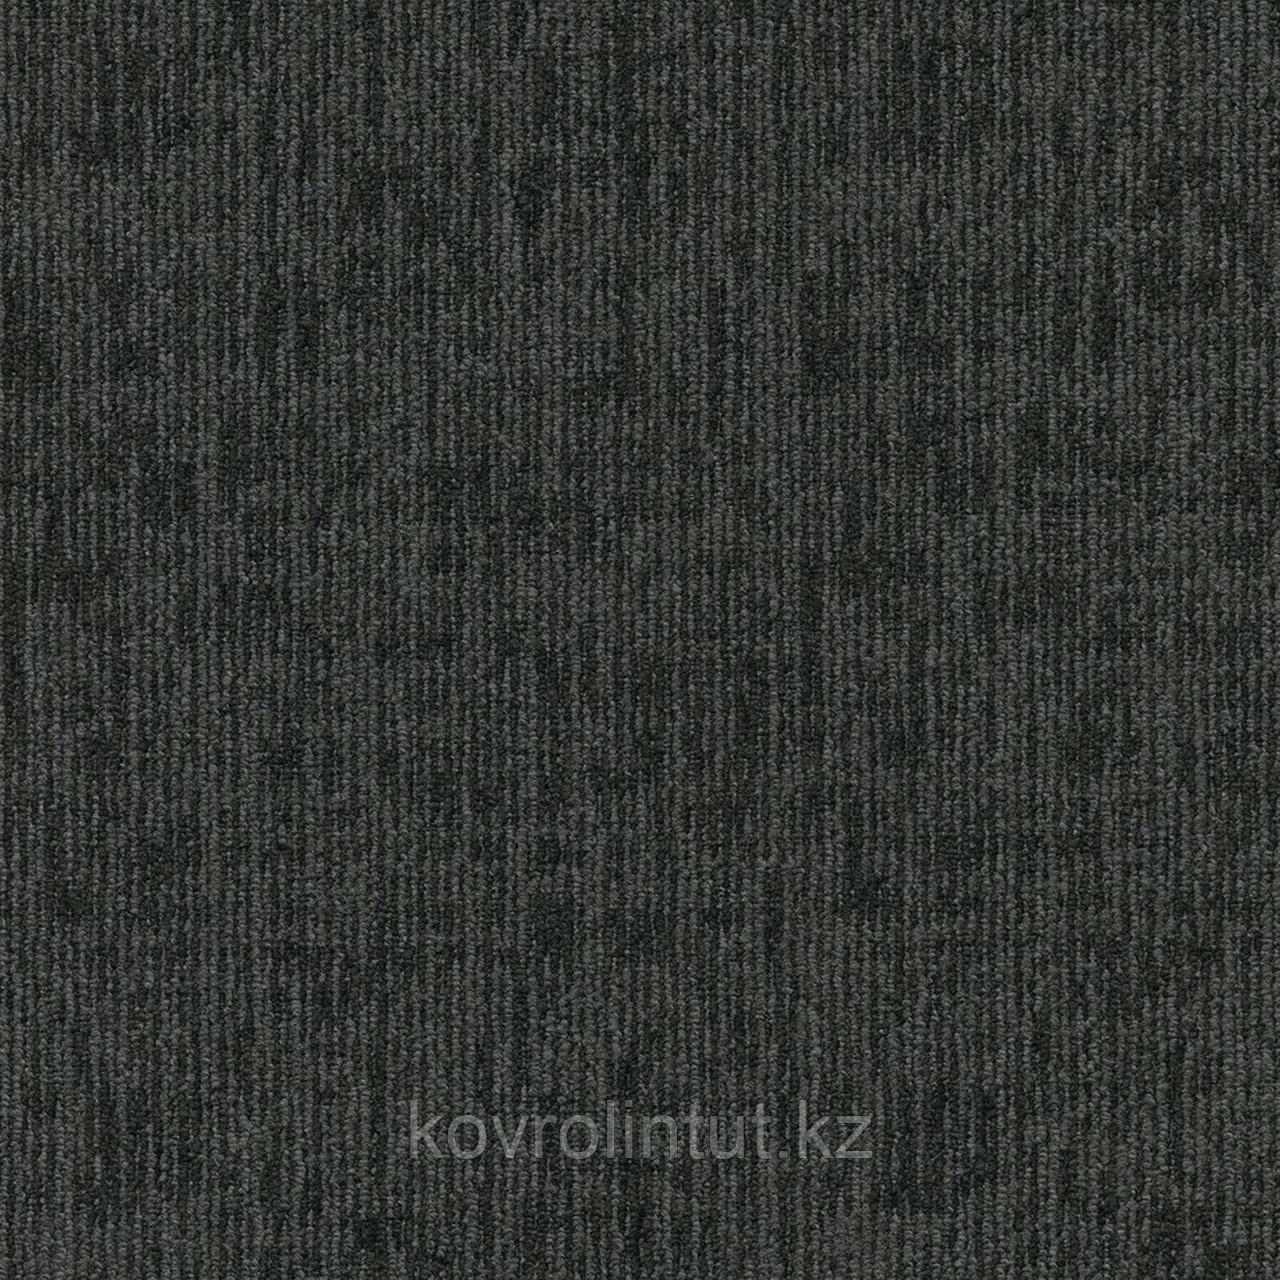 Плитка ковровая Modulyss First Absolute 993, 100% PA